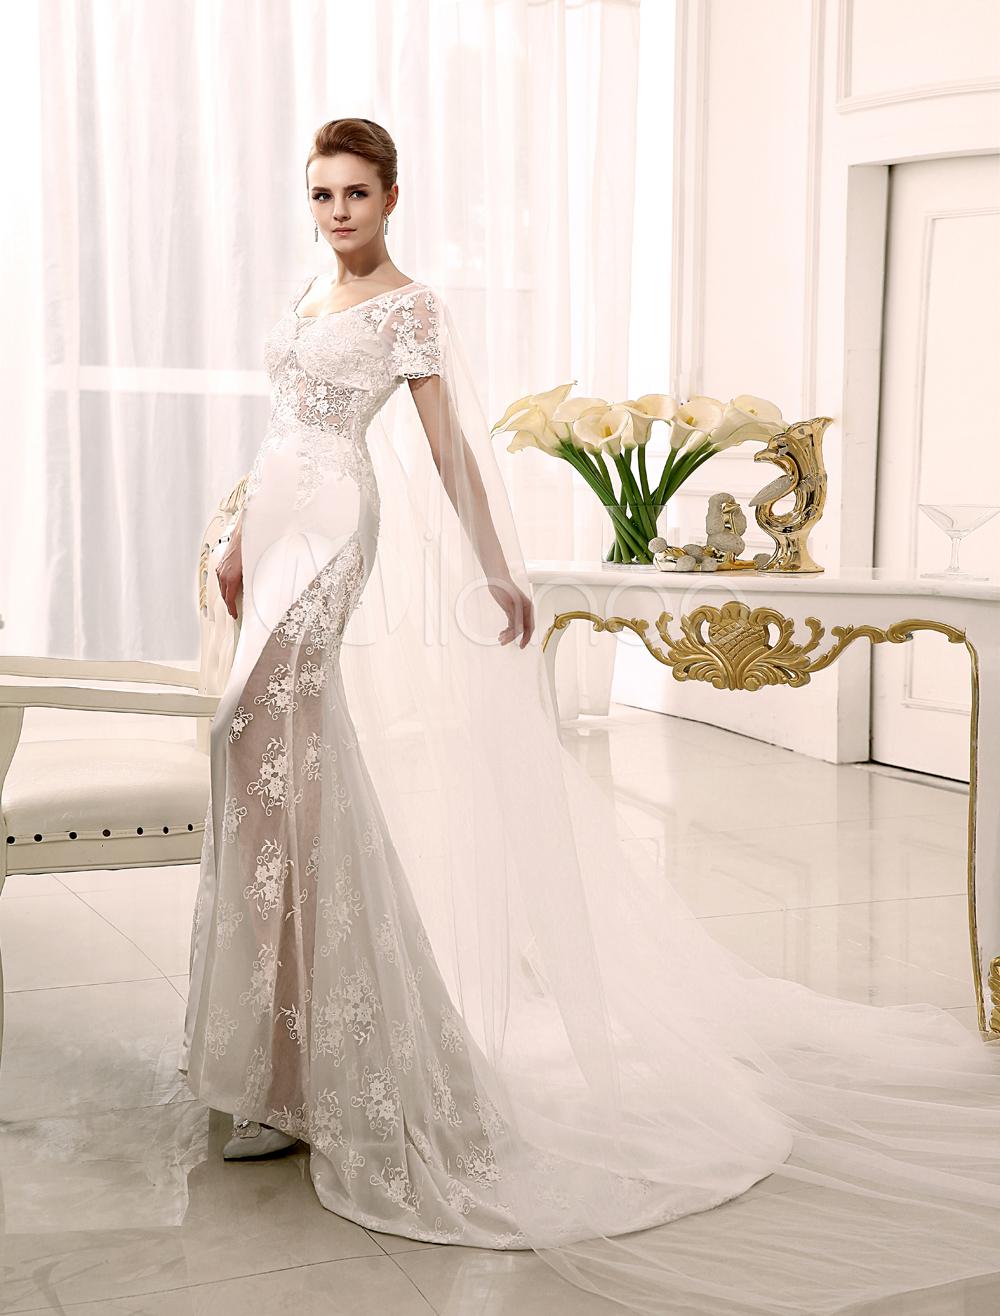 Mermaid watteau train ivory applique bridal wedding dress with scoop